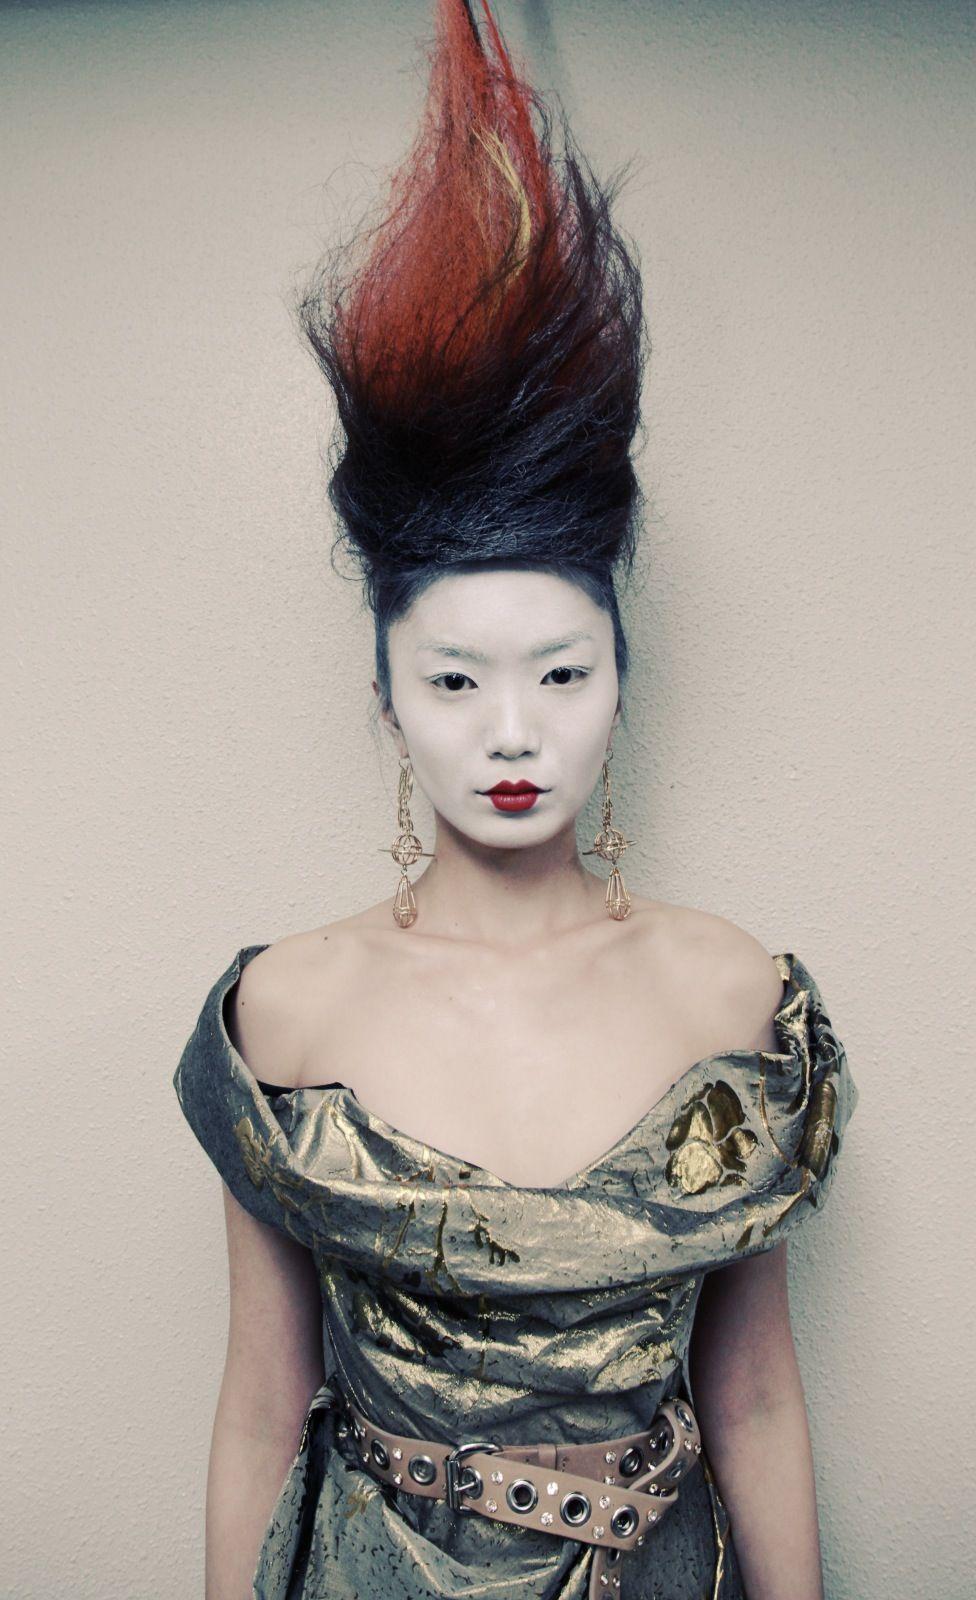 Catwalk by tigi collaborates on semele walk wardrobe and styling by